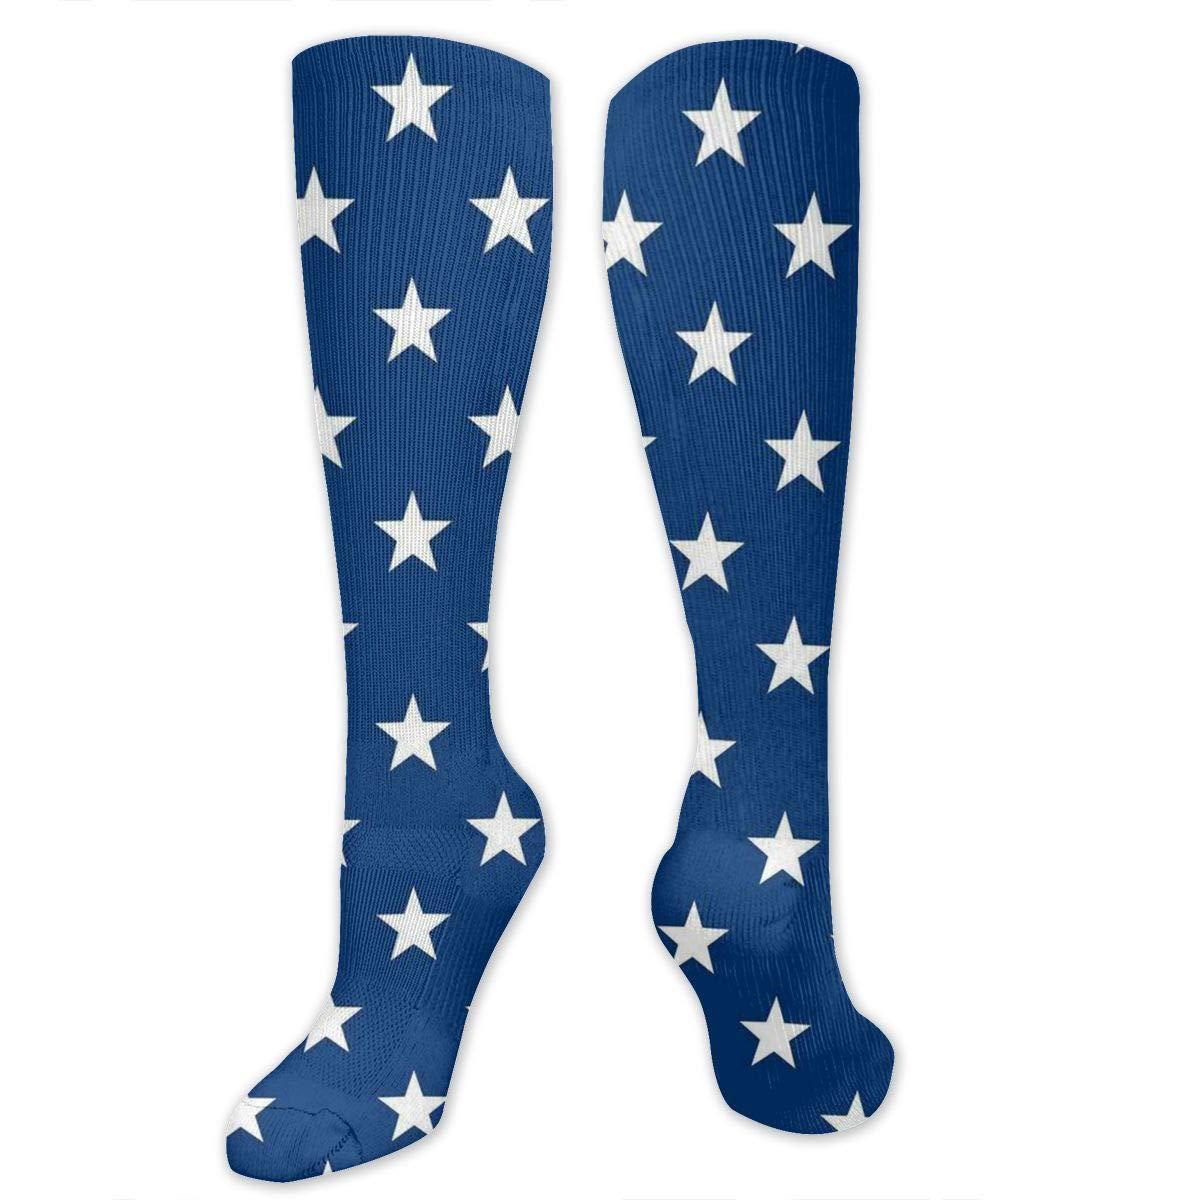 Stretch Socks Universe Stylish Winter Warmth for Women /& Men Athletic Sports